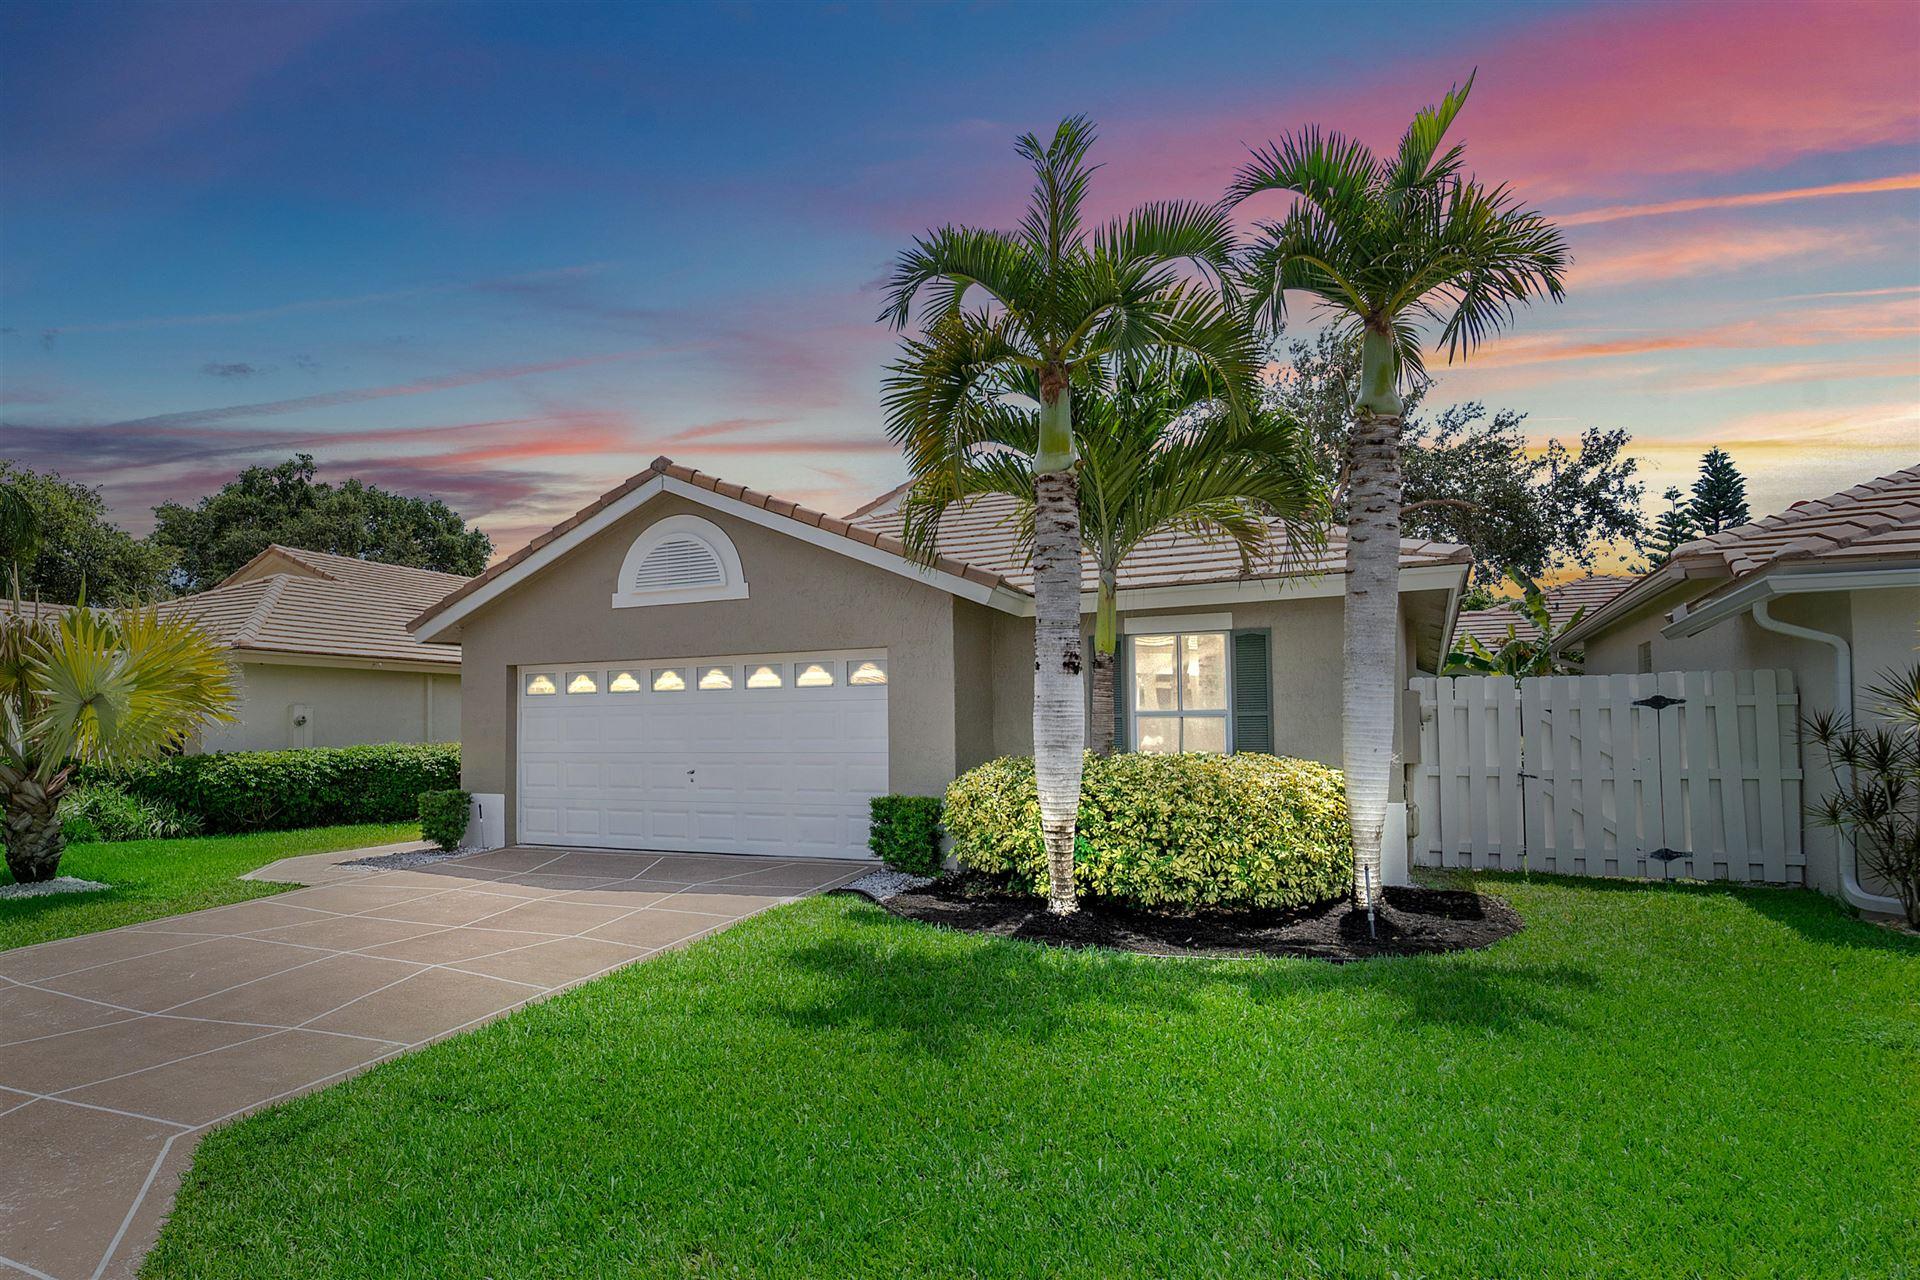 7828 Manor Forest Court, Boynton Beach, FL 33436 - #: RX-10637487